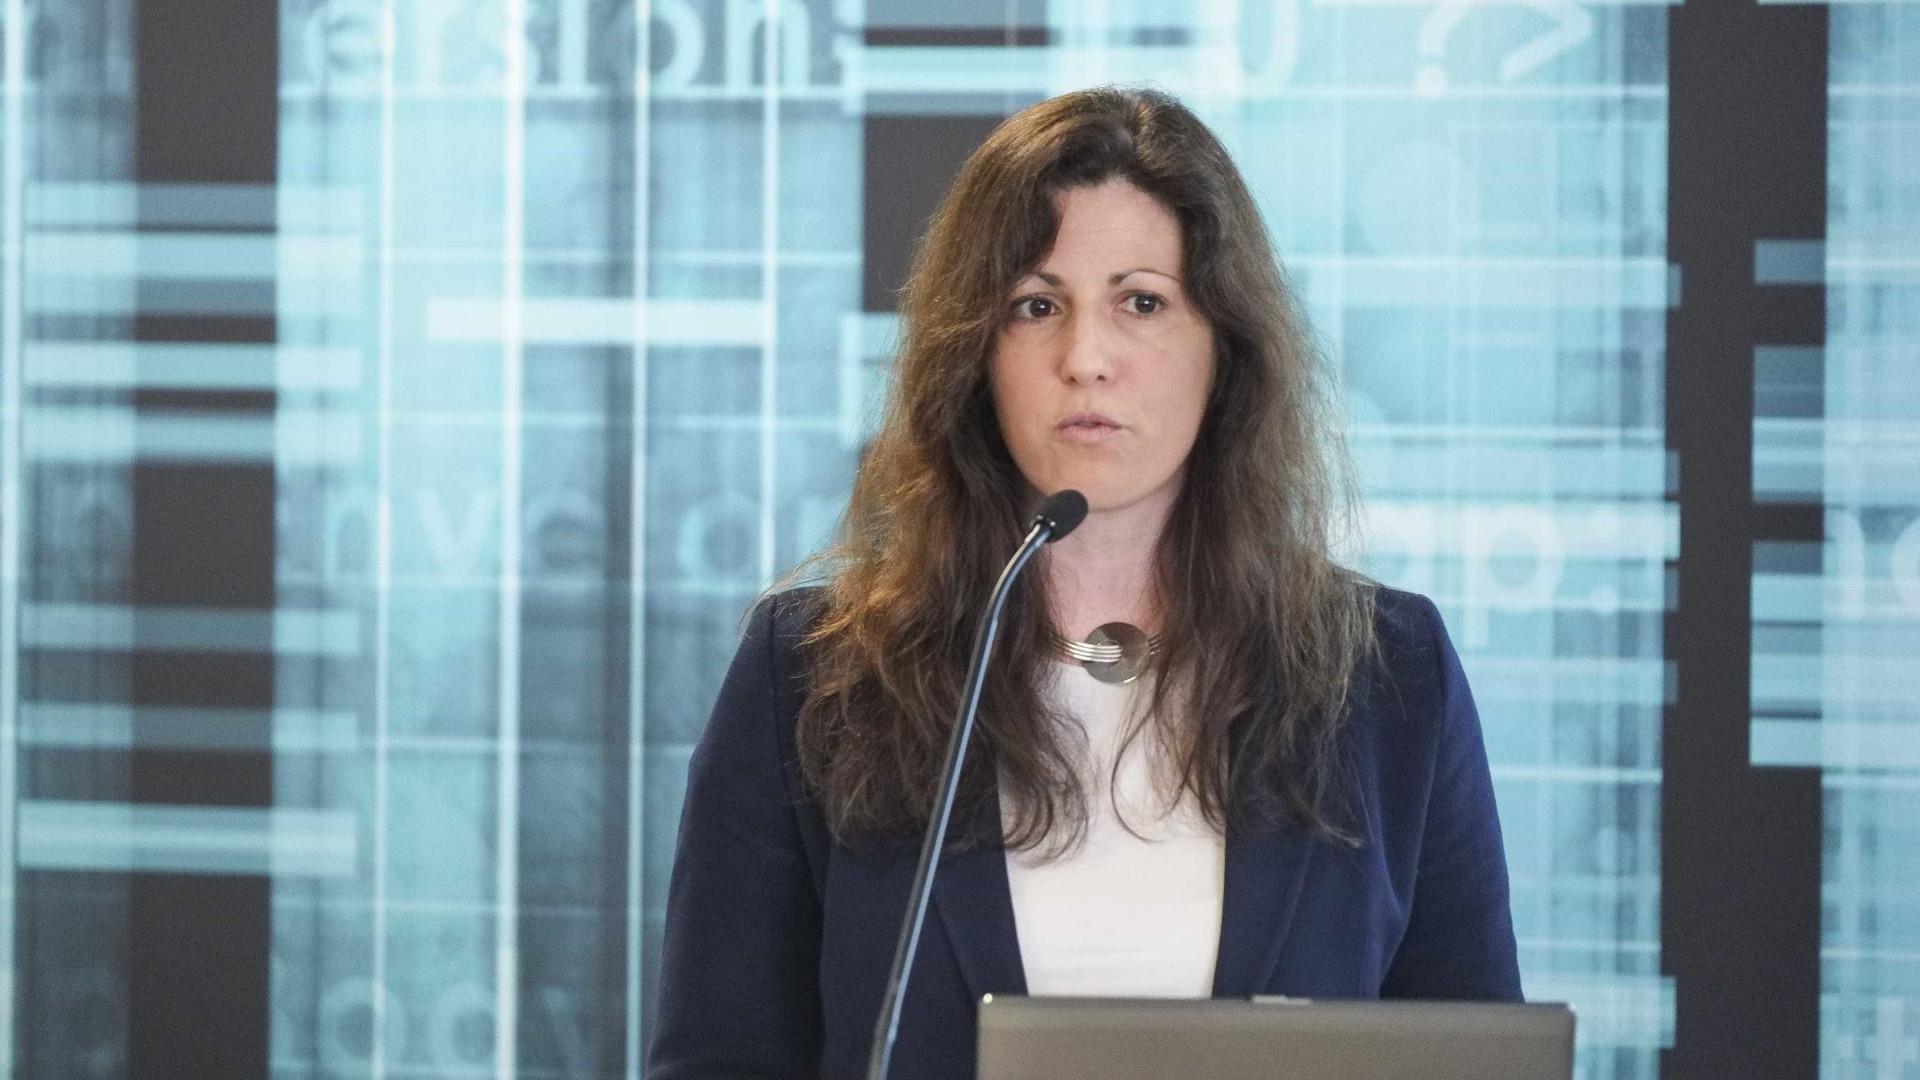 Incentivo a empregadores a contribuir para PPR do Estado igual a privados